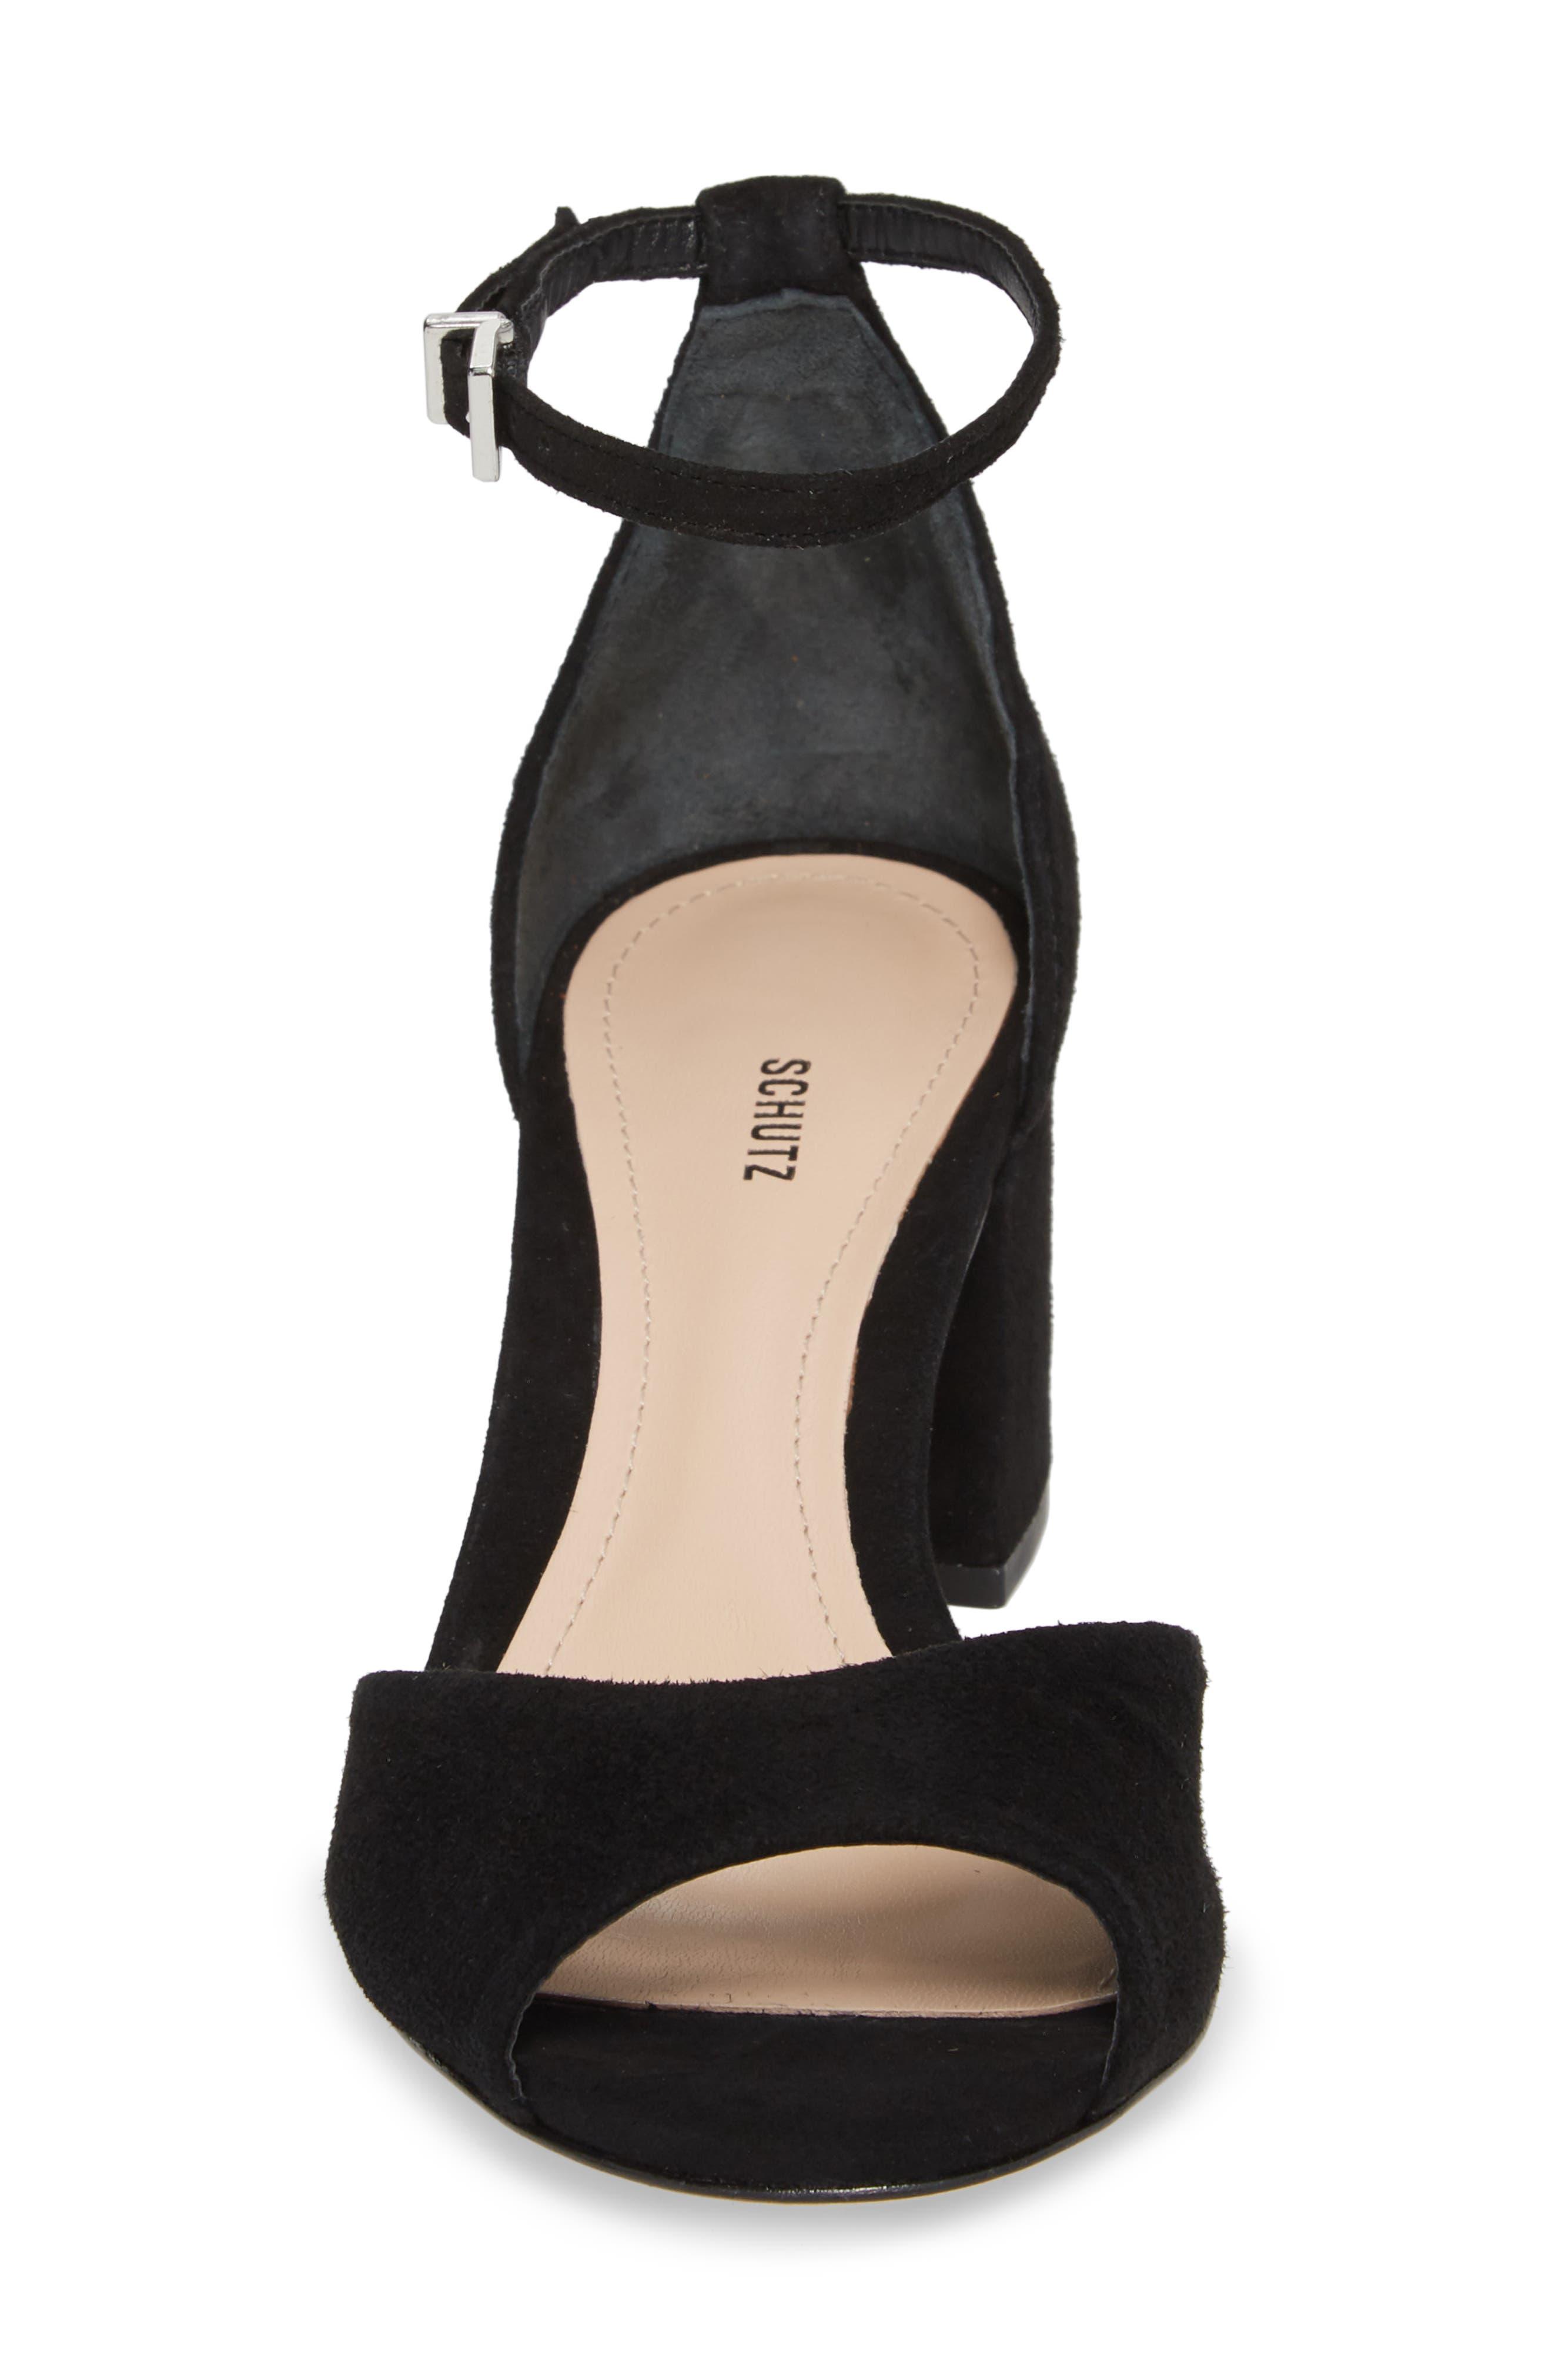 Roama Block Heel Sandal,                             Alternate thumbnail 4, color,                             Black Suede